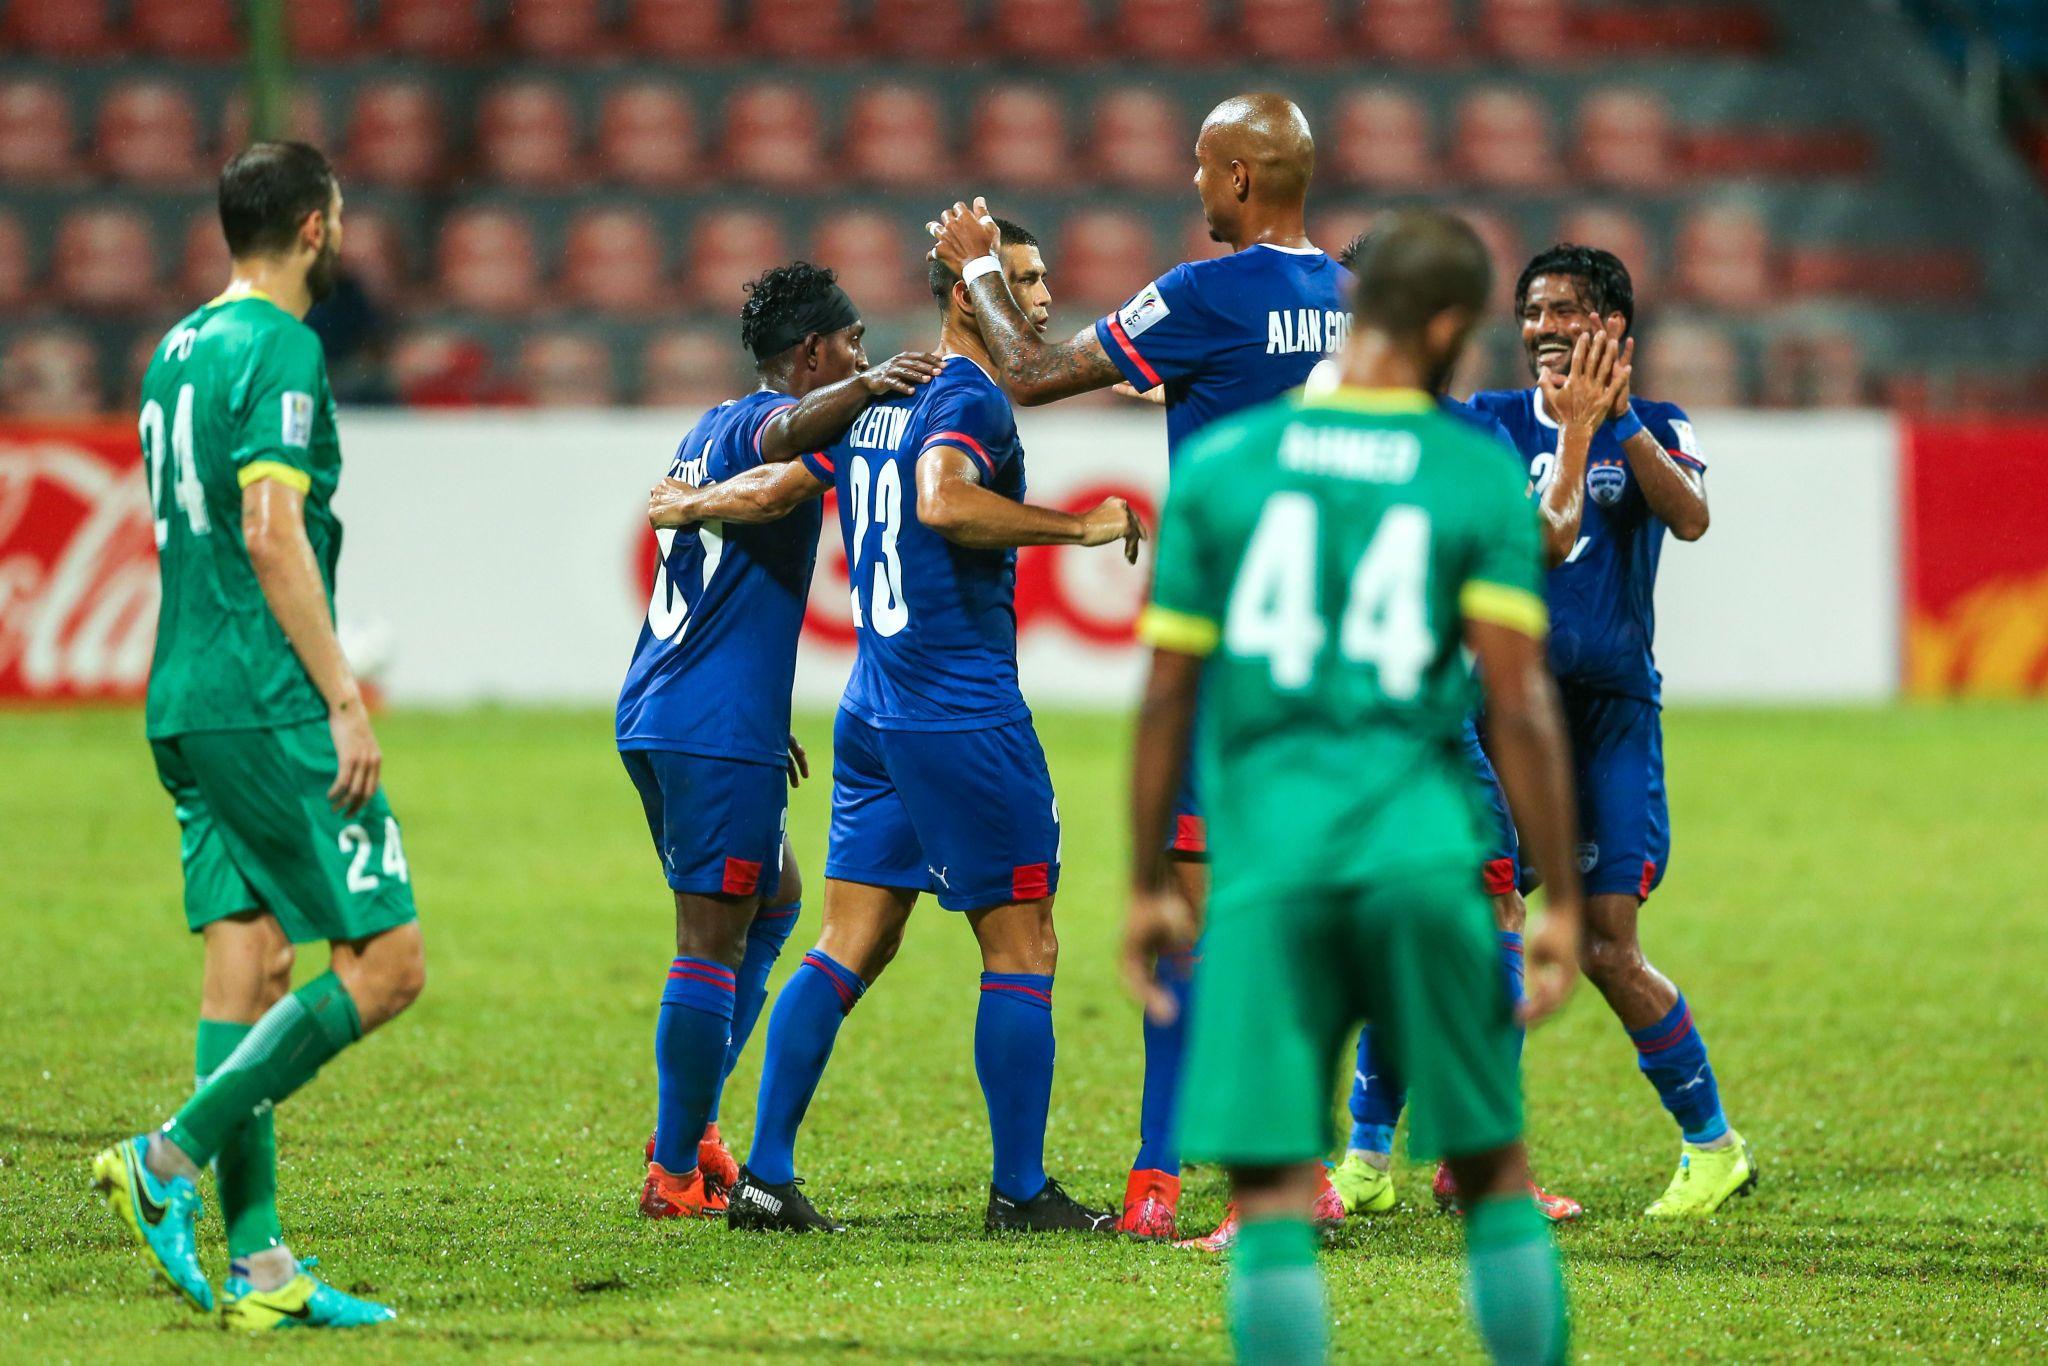 Bengaluru players celebrate Cleiton Silva's goal